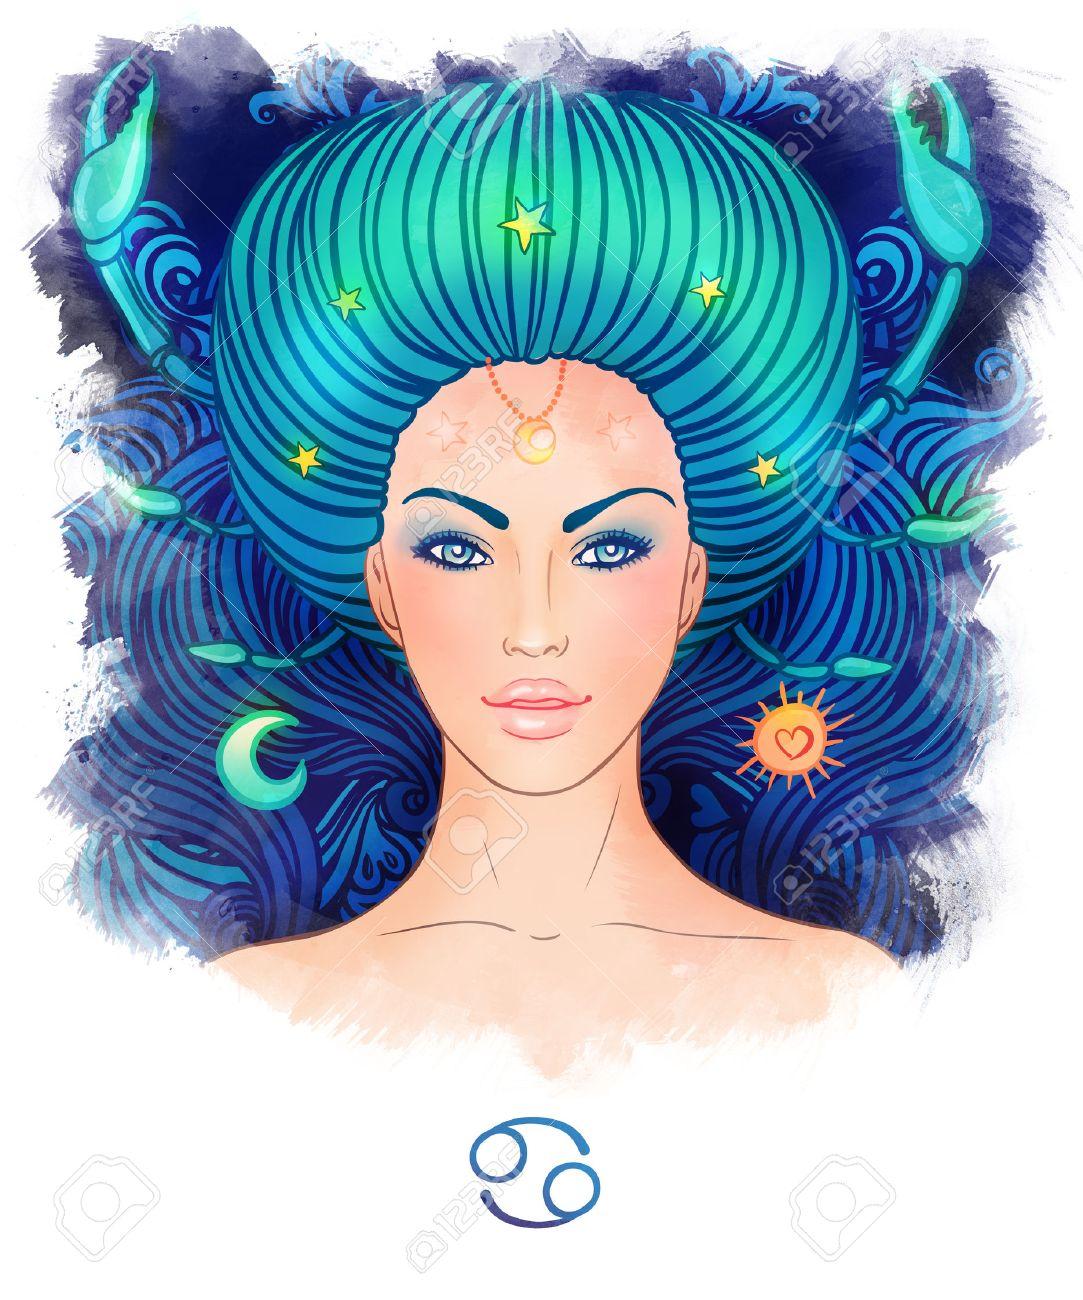 CANCER  KREBS zodiac sign